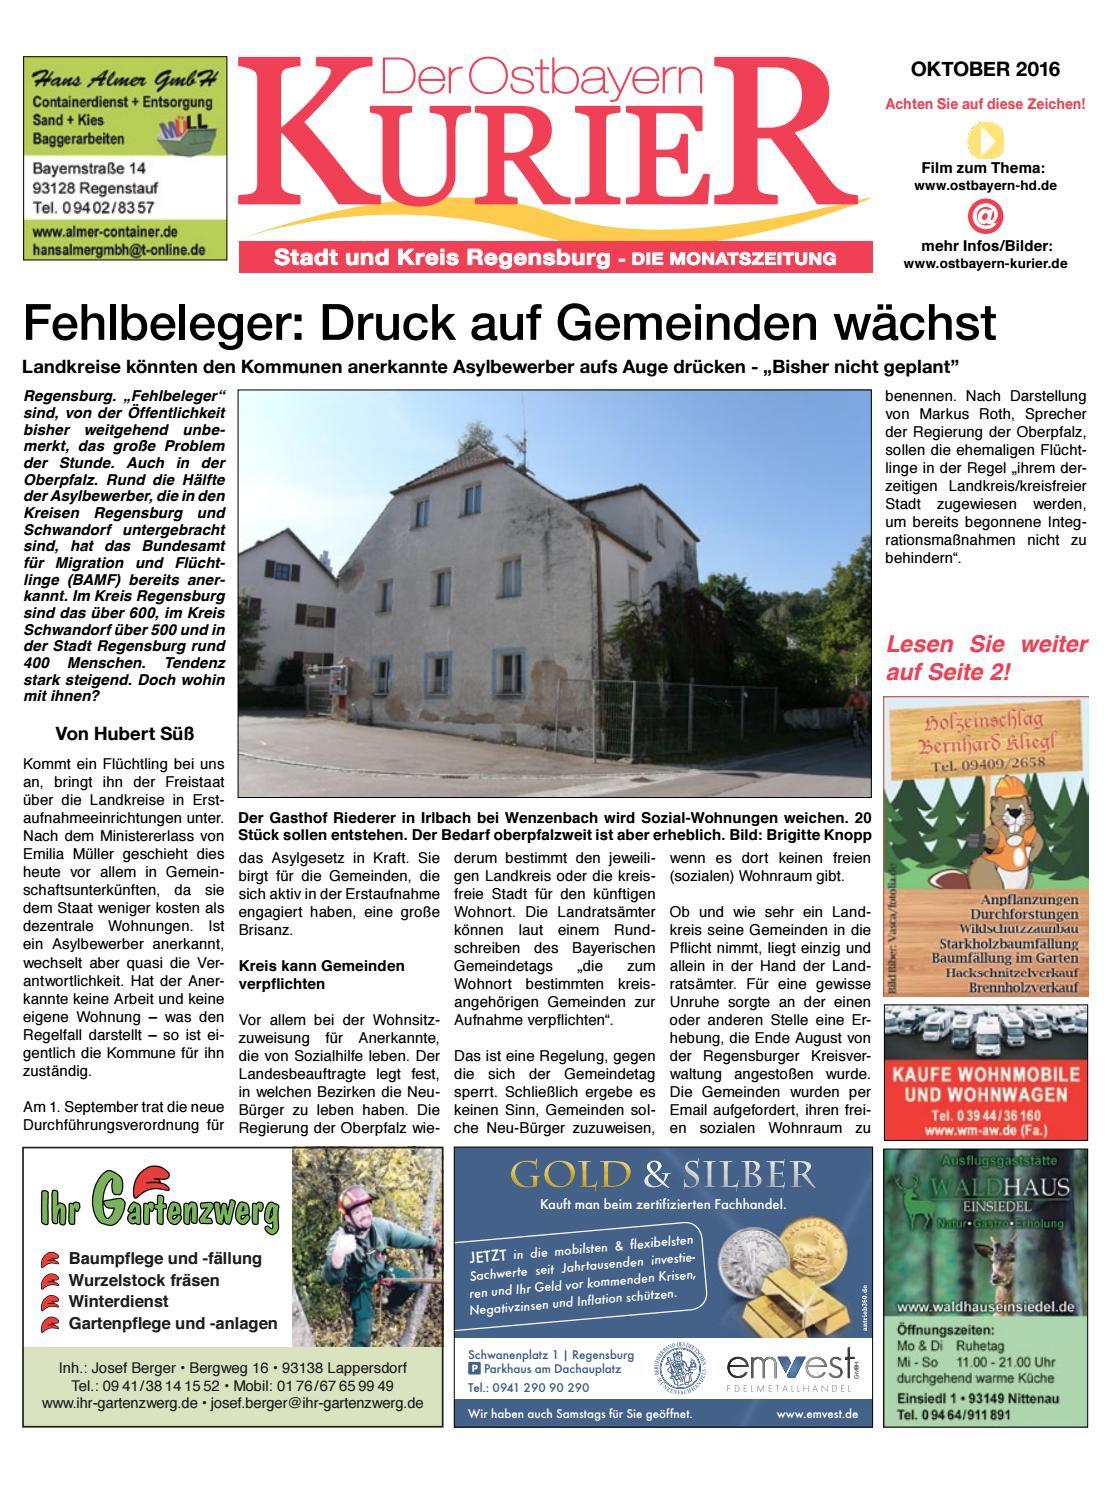 Sued ostbayern kurier oktober 2016 by Medienverlag Hubert Süß - issuu